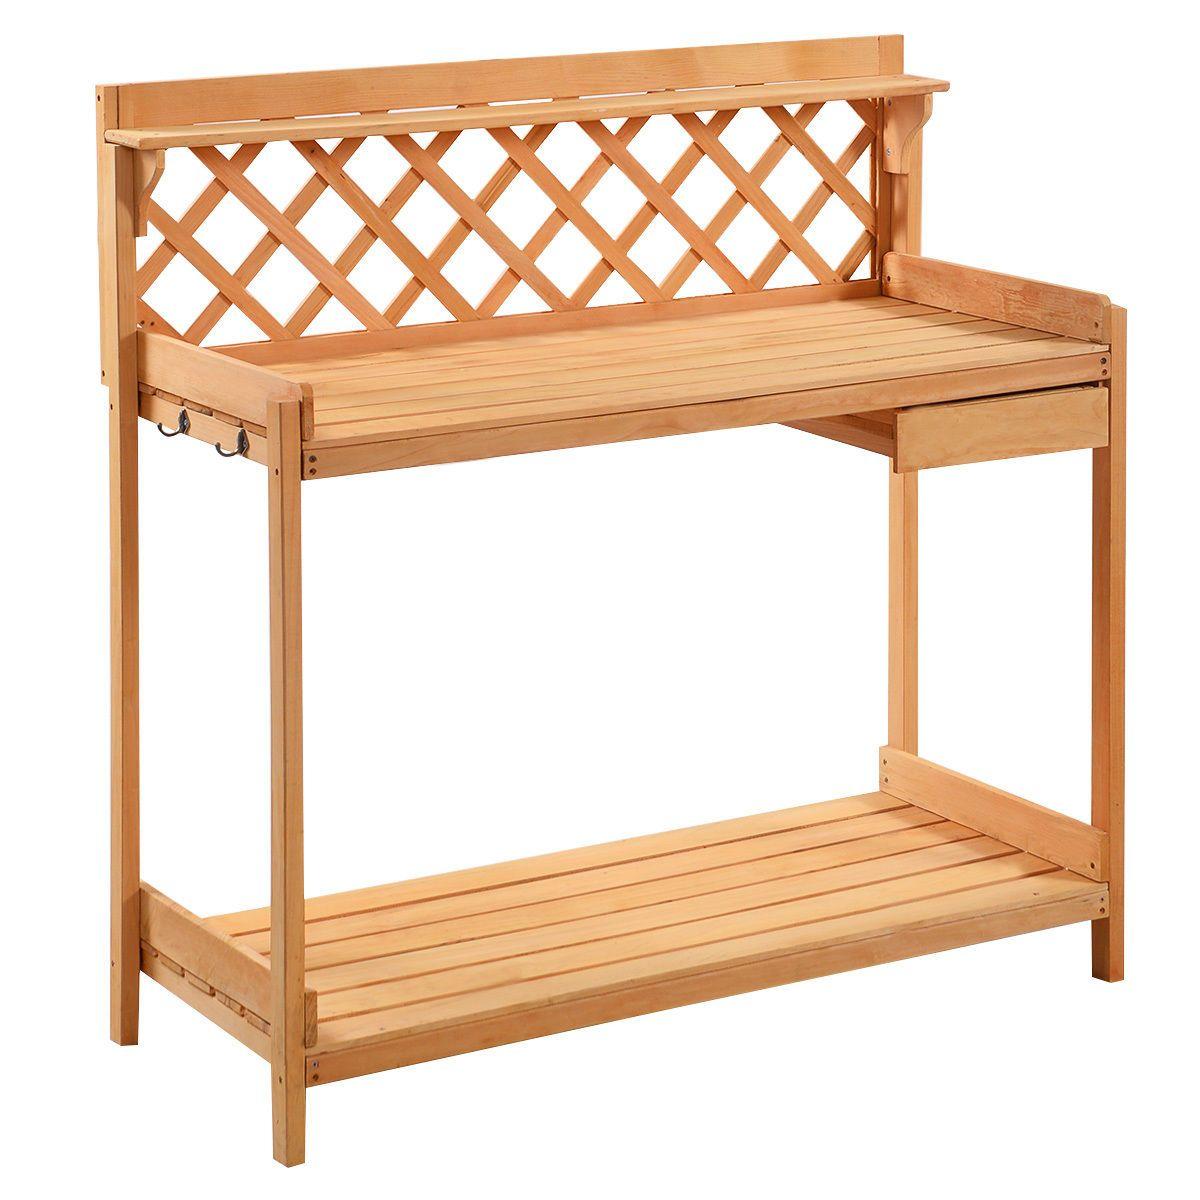 Online Cheap Potting Bench Outdoor Garden Work Bench